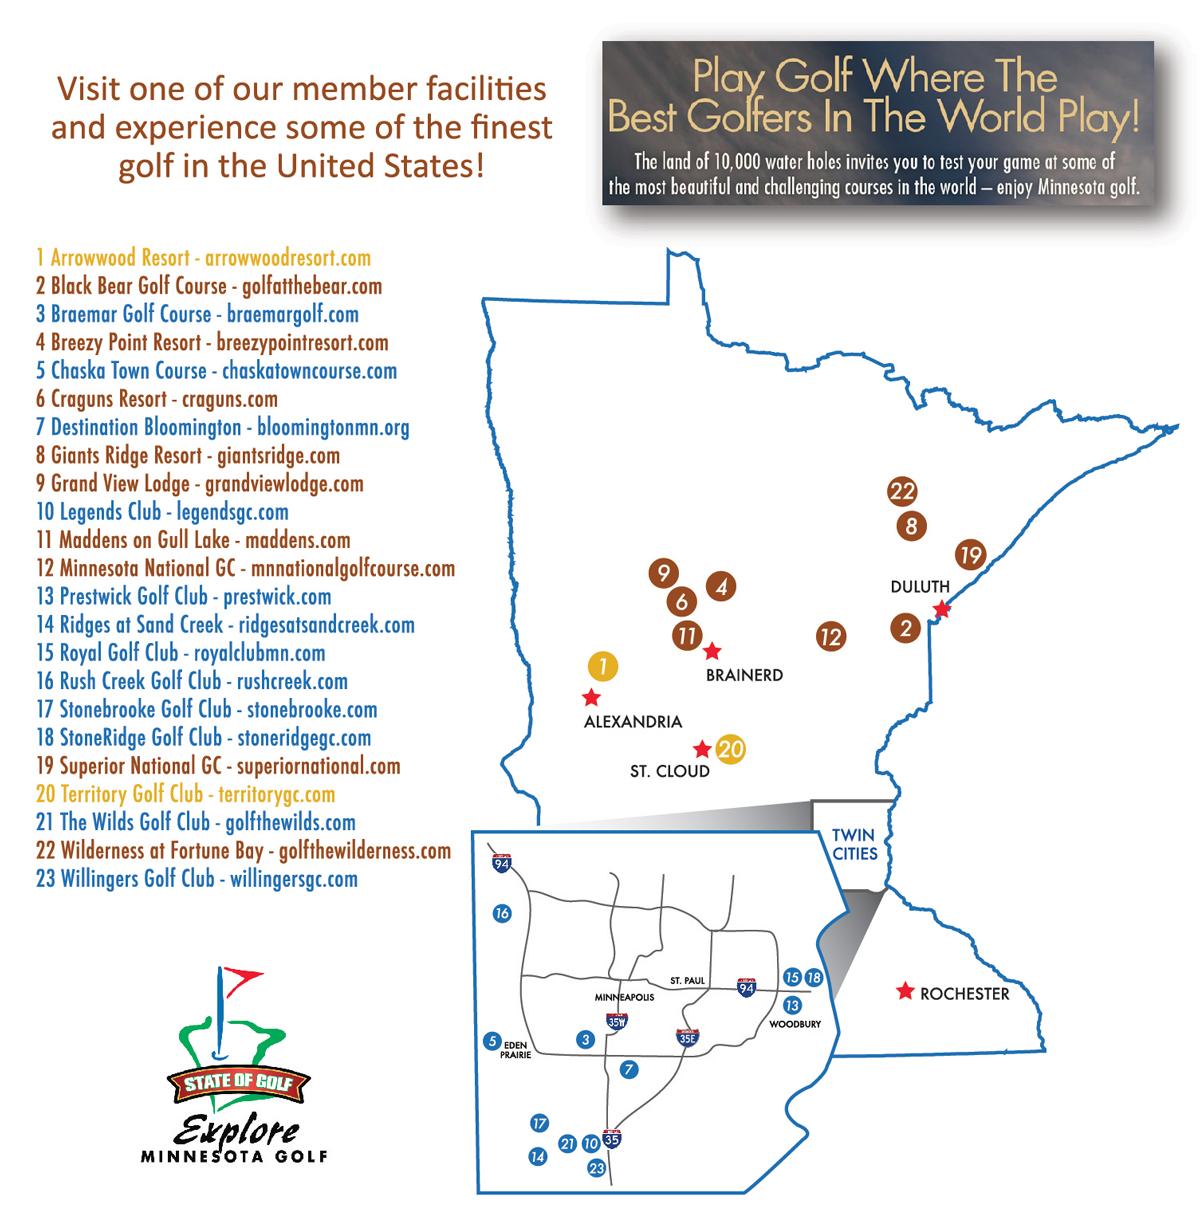 Explore Minnesota Golf Members